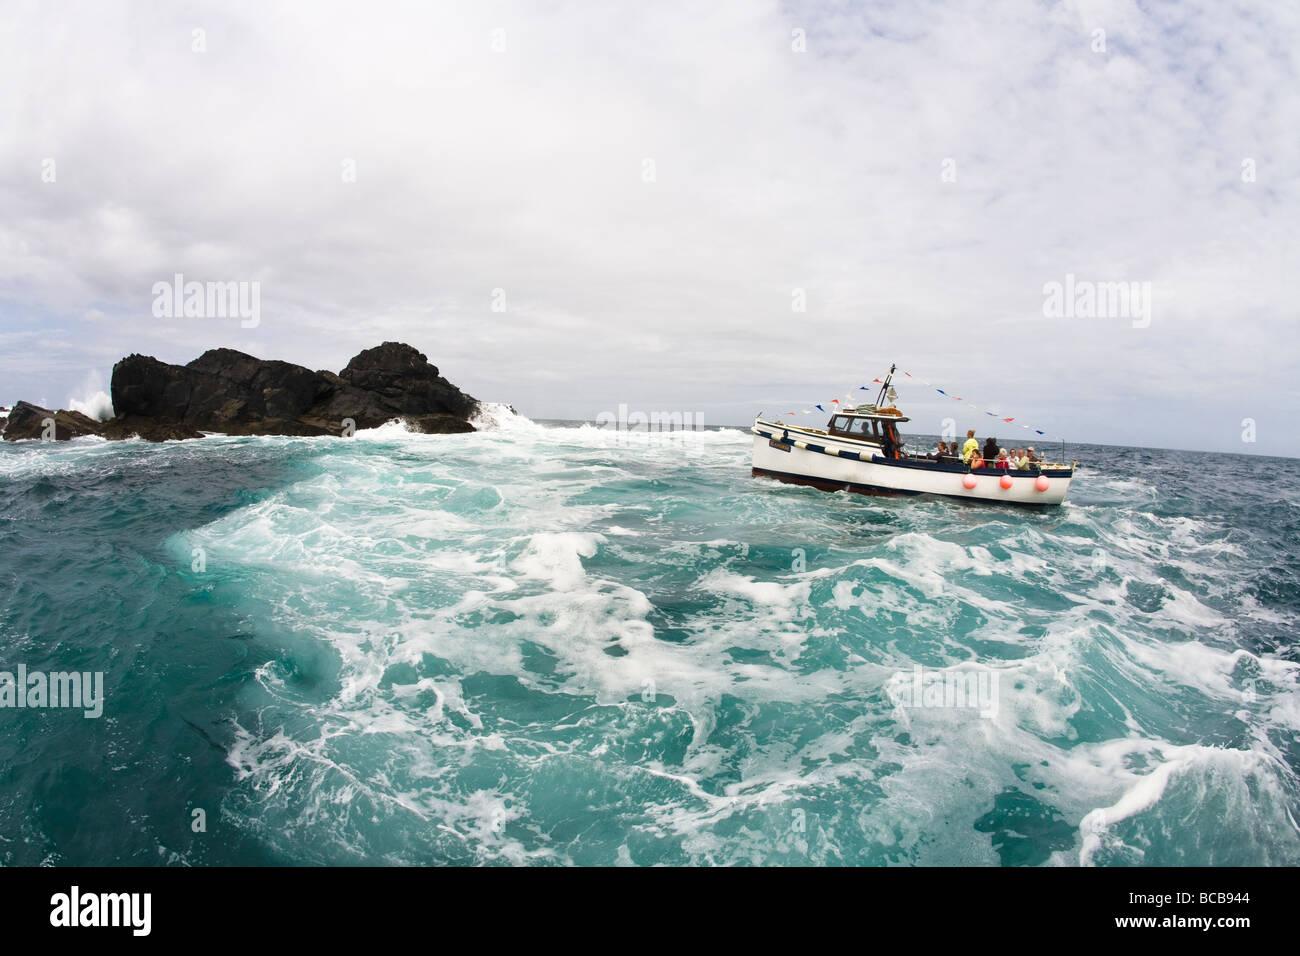 Viaje en barco Seahorse Seal Island St Ives Riviera Cornualles Cornualles Inglaterra Reino Unido GB Gran Bretaña Imagen De Stock